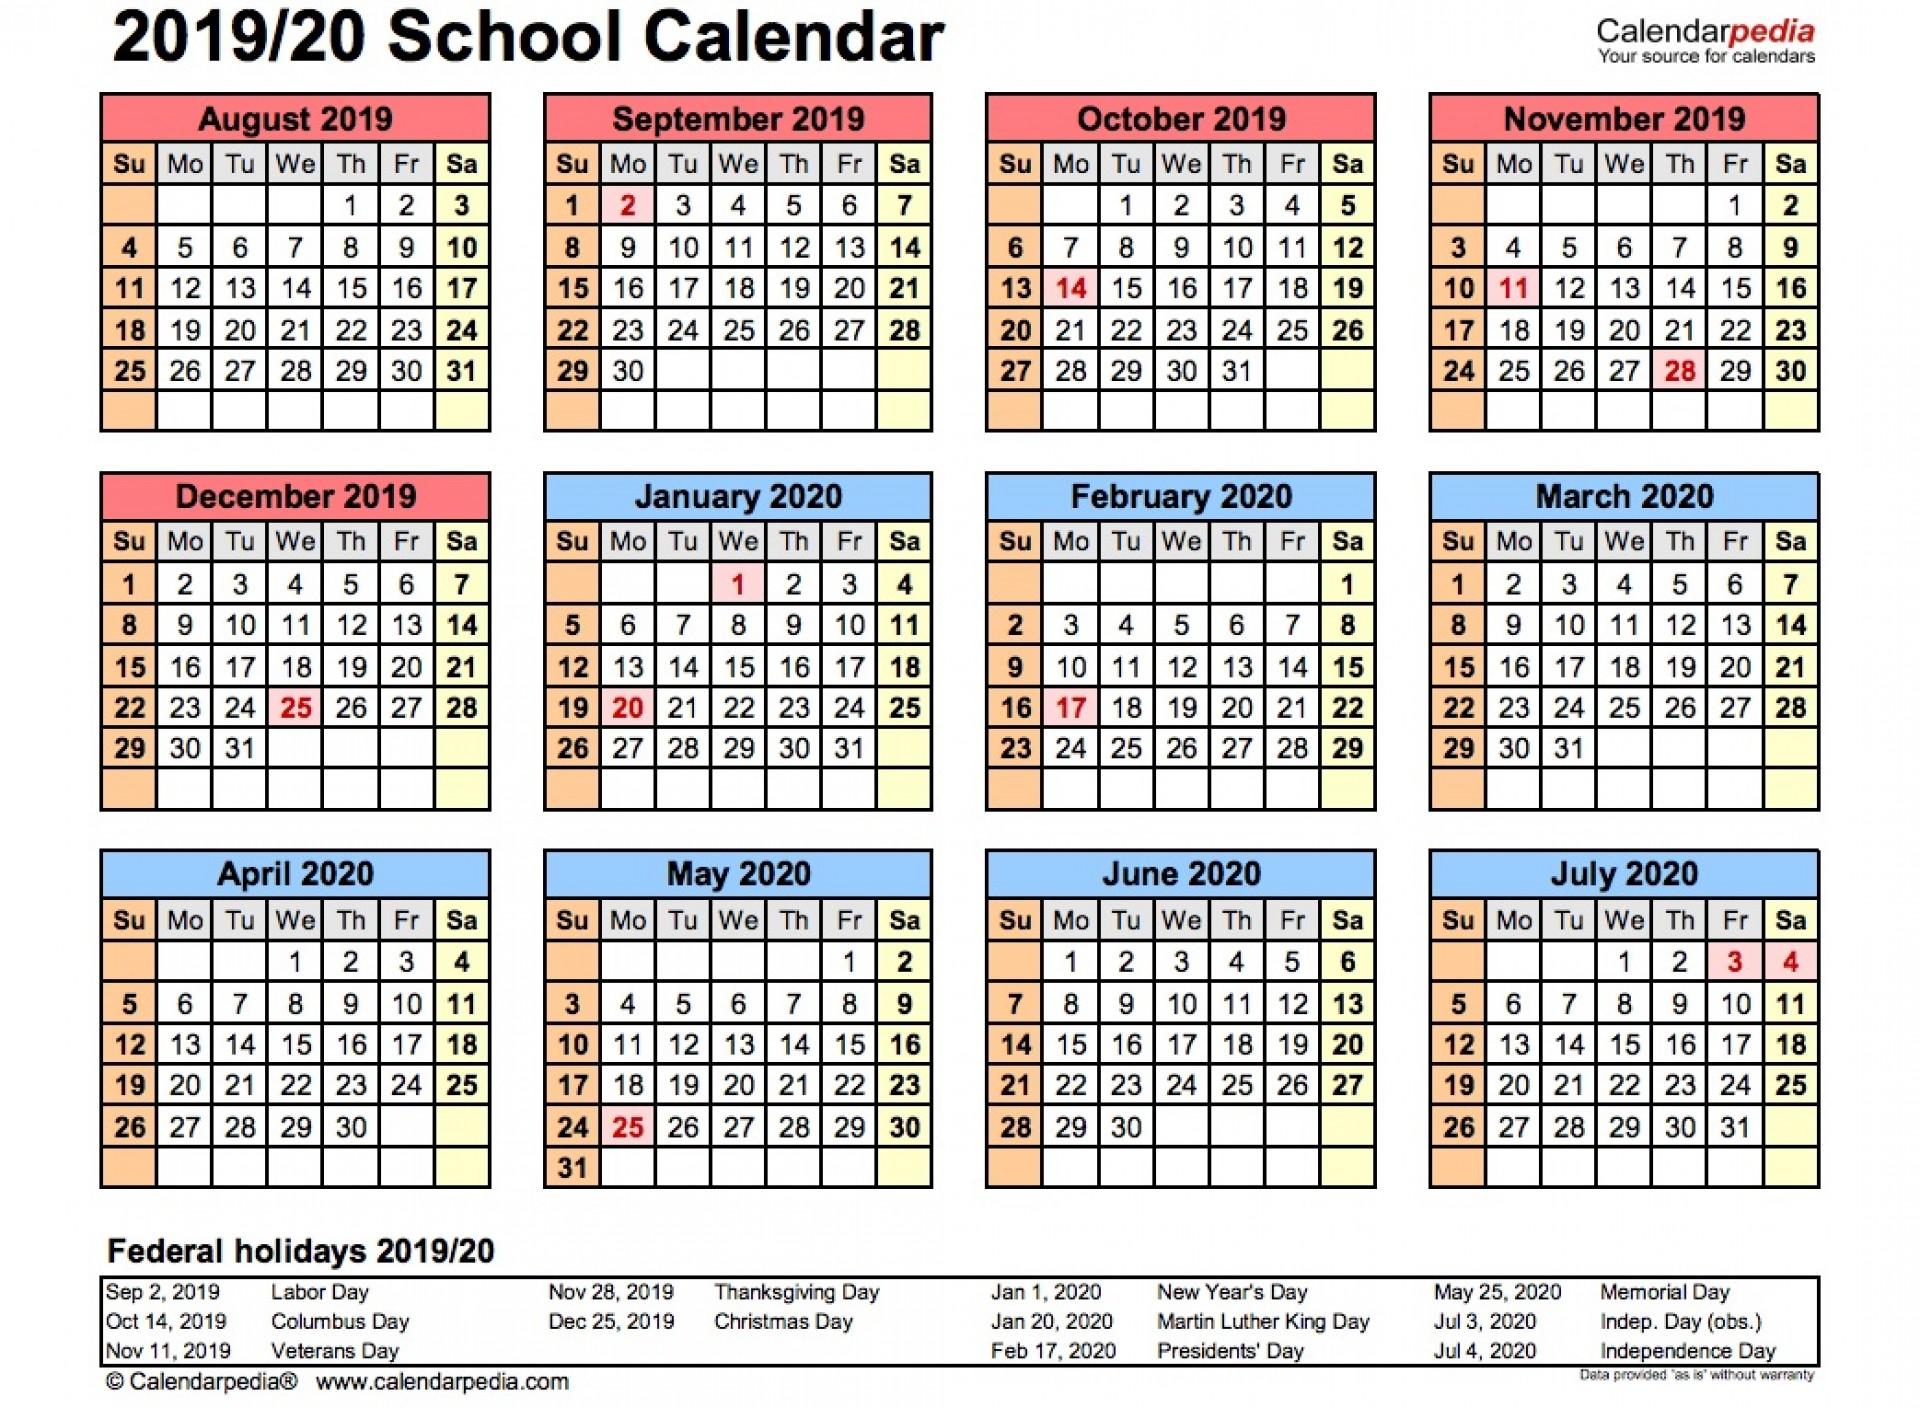 008 Phenomenal School Year Calendar Template High Resolution  Excel 2019-20 Word1920